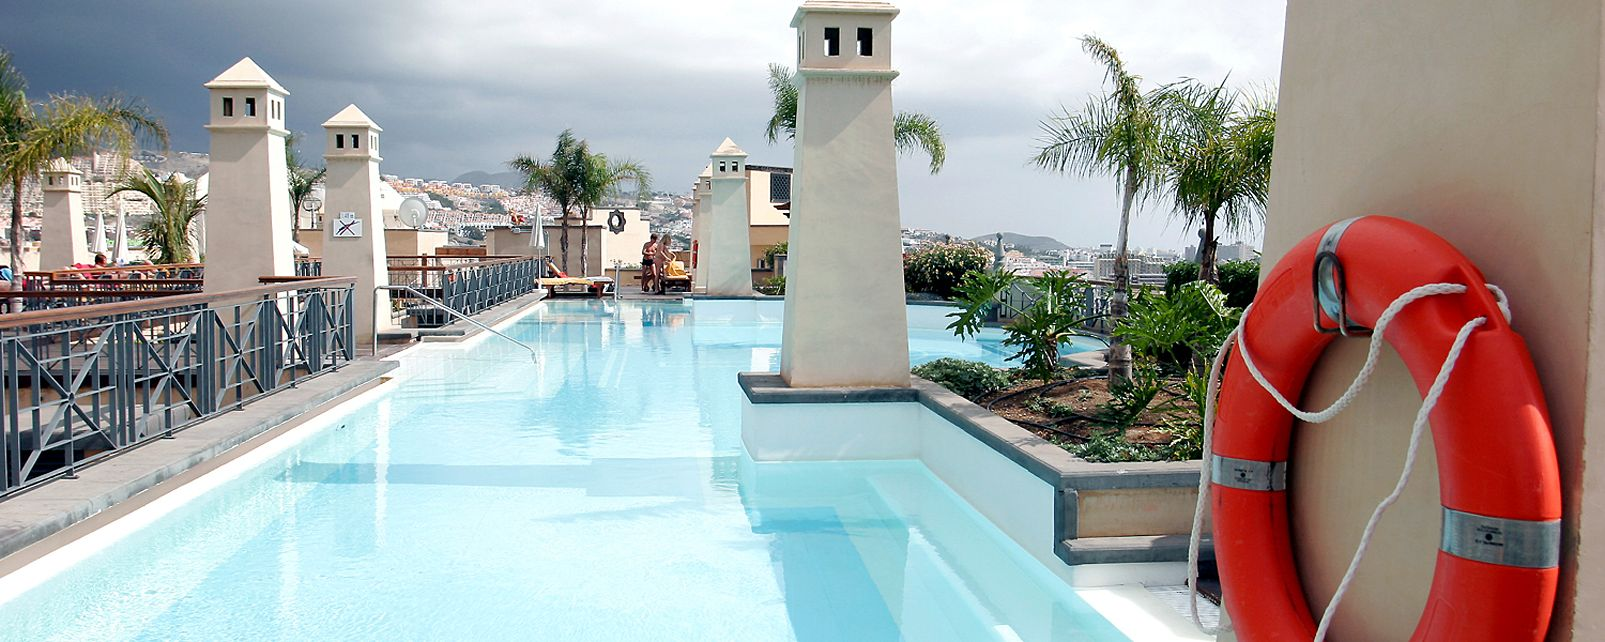 Hotel Costa Adeje Gran Hotel